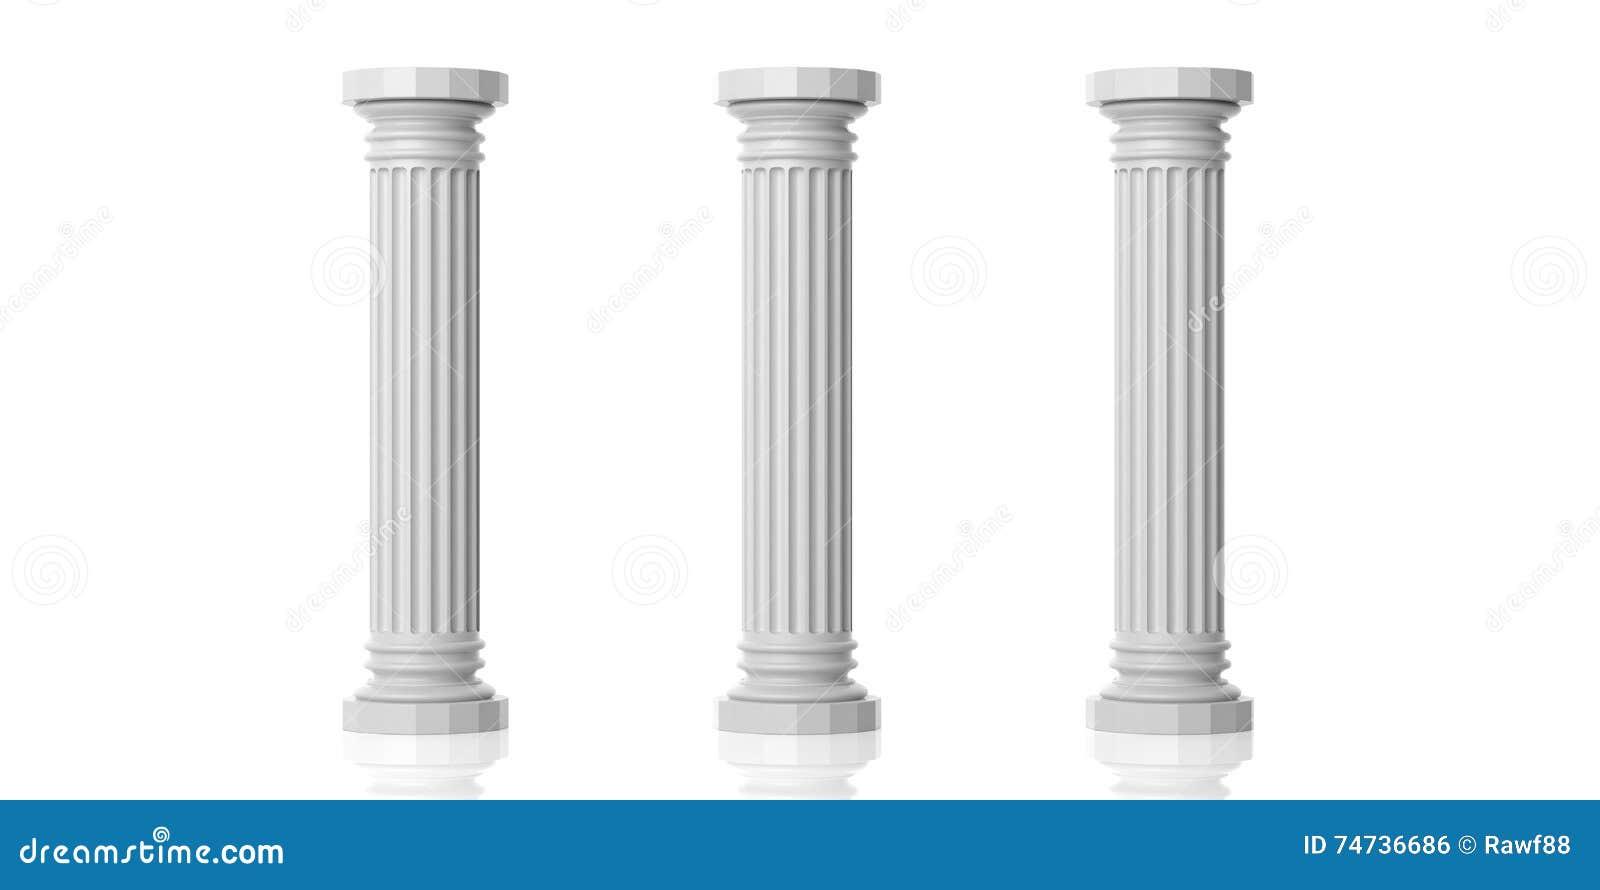 White Metal Pillars : Rendering of three storey light metal rack isolated on the